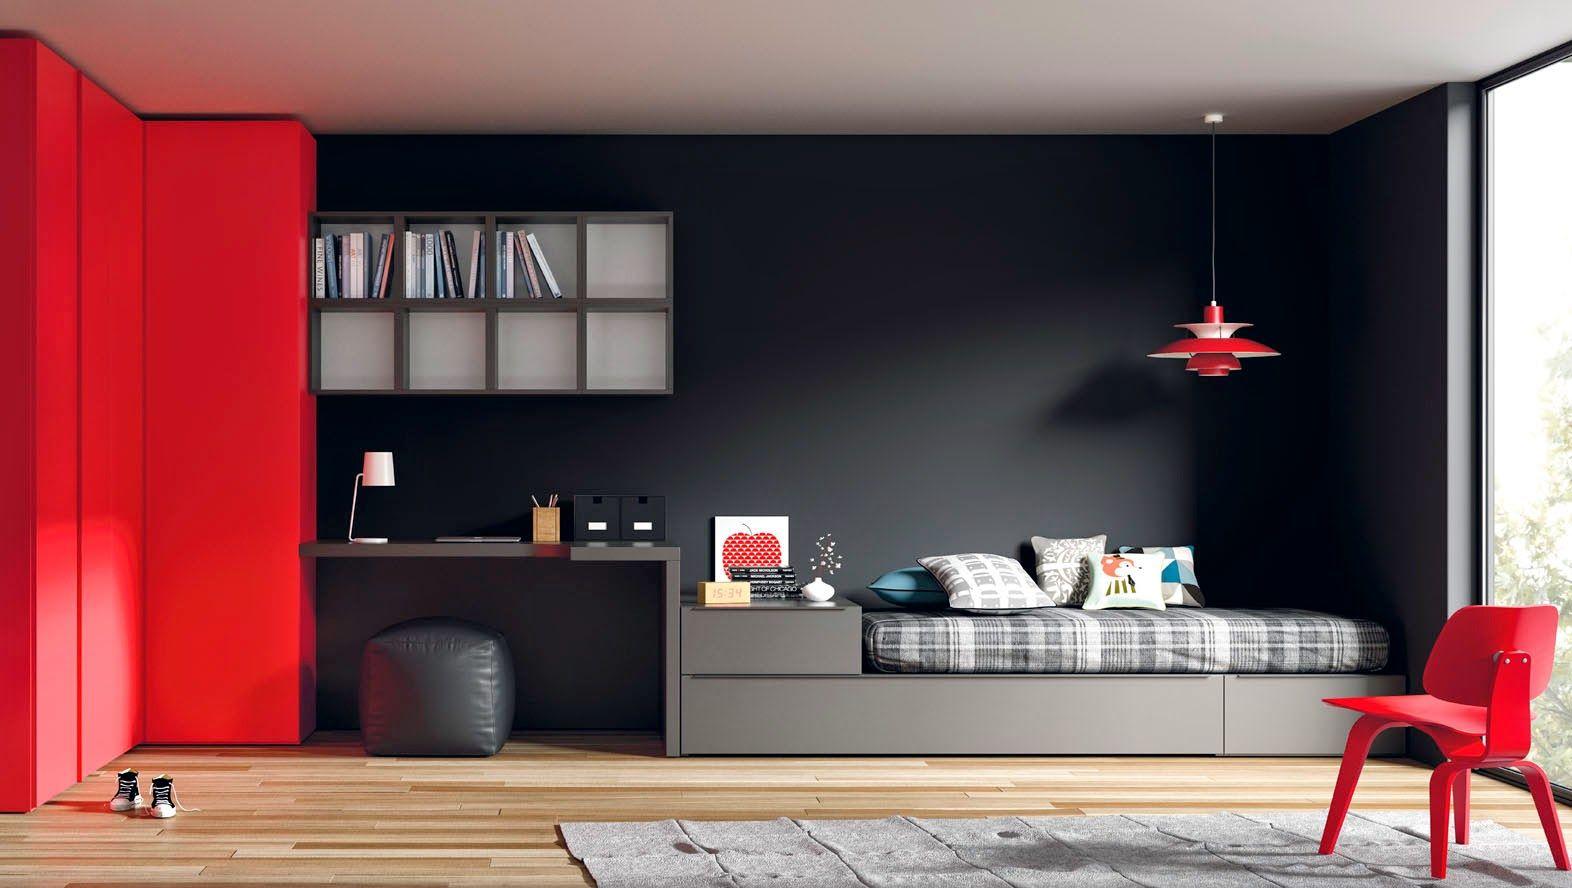 Muebles Modernos Para Dormitorios Juveniles Donde Podr S Encontrar  # Muebles Podridos